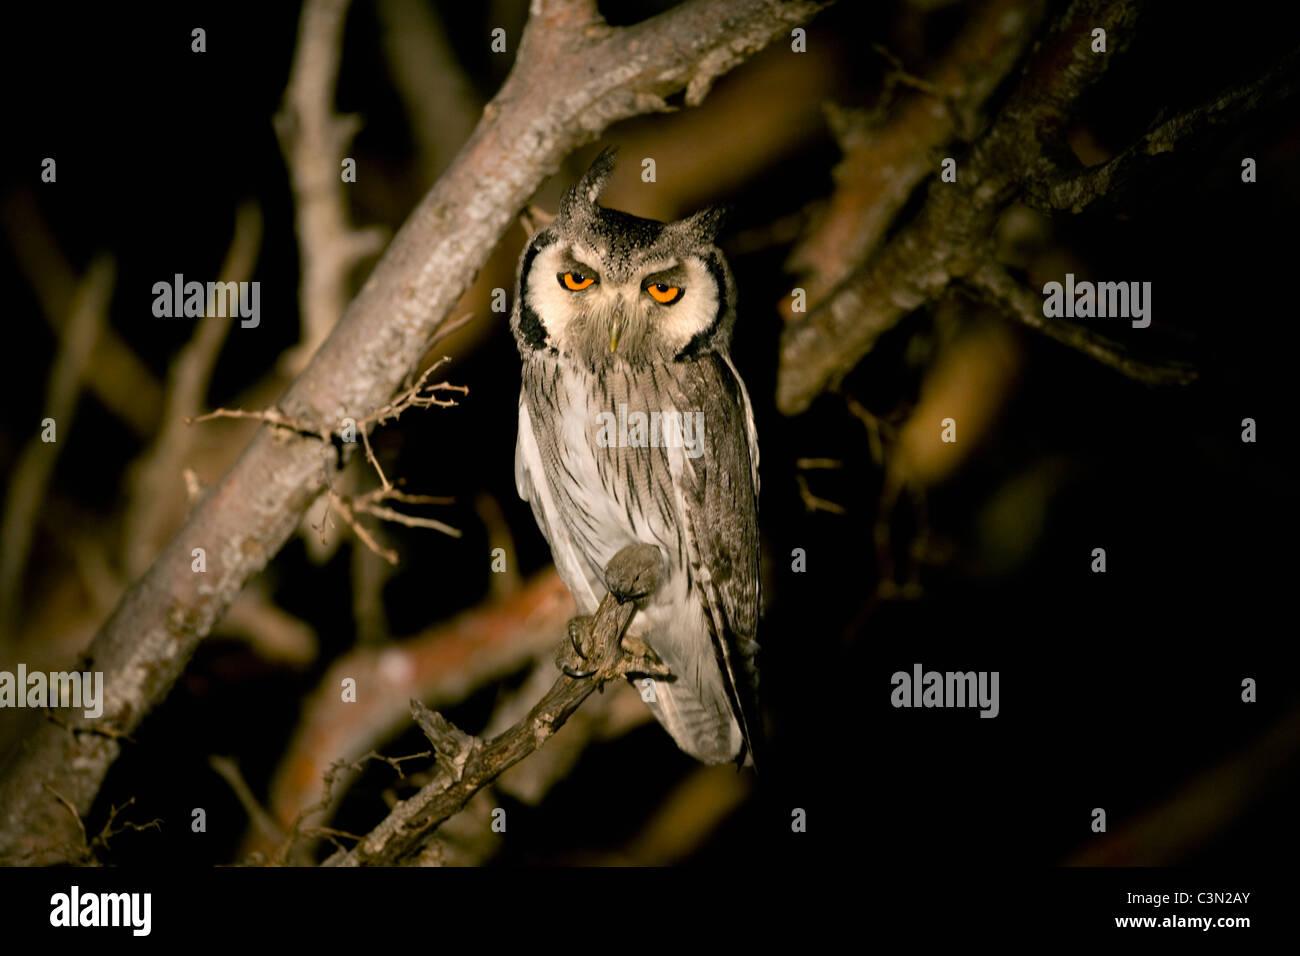 South Africa, Near Zeerust, Madikwe National Park. Southern White-faced Scops-Owl, Ptilopsis granti at night. - Stock Image